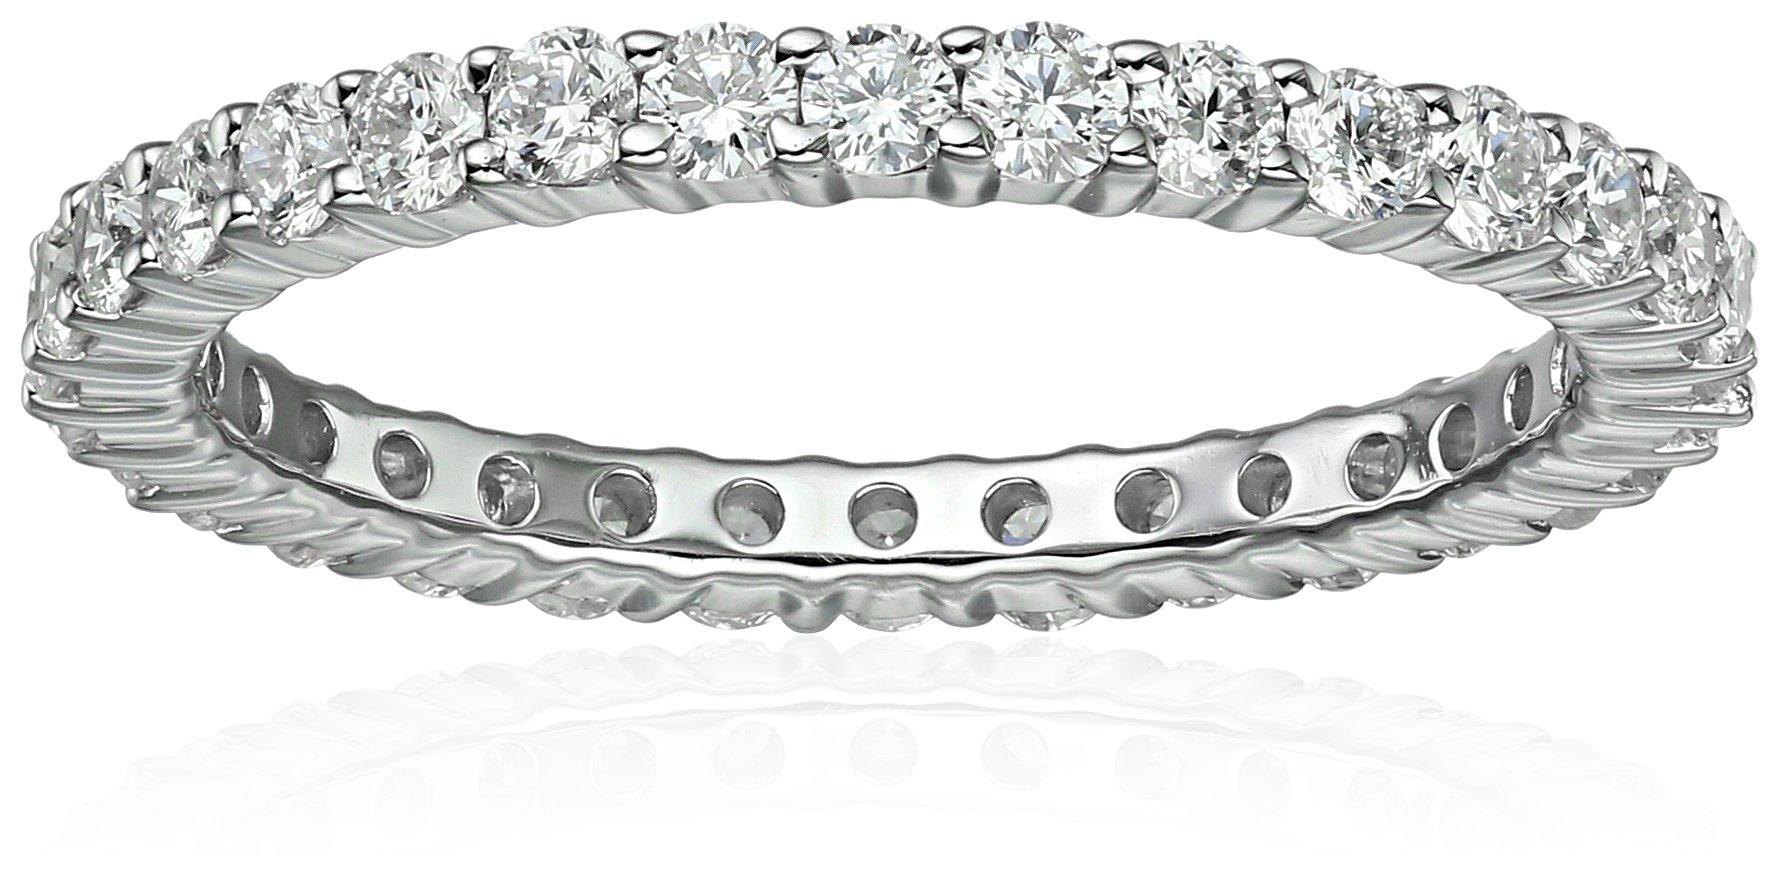 14k White Gold Diamond Prong Eternity Ring (1cttw, H-I Color, I1-I2 Clarity), Size 7